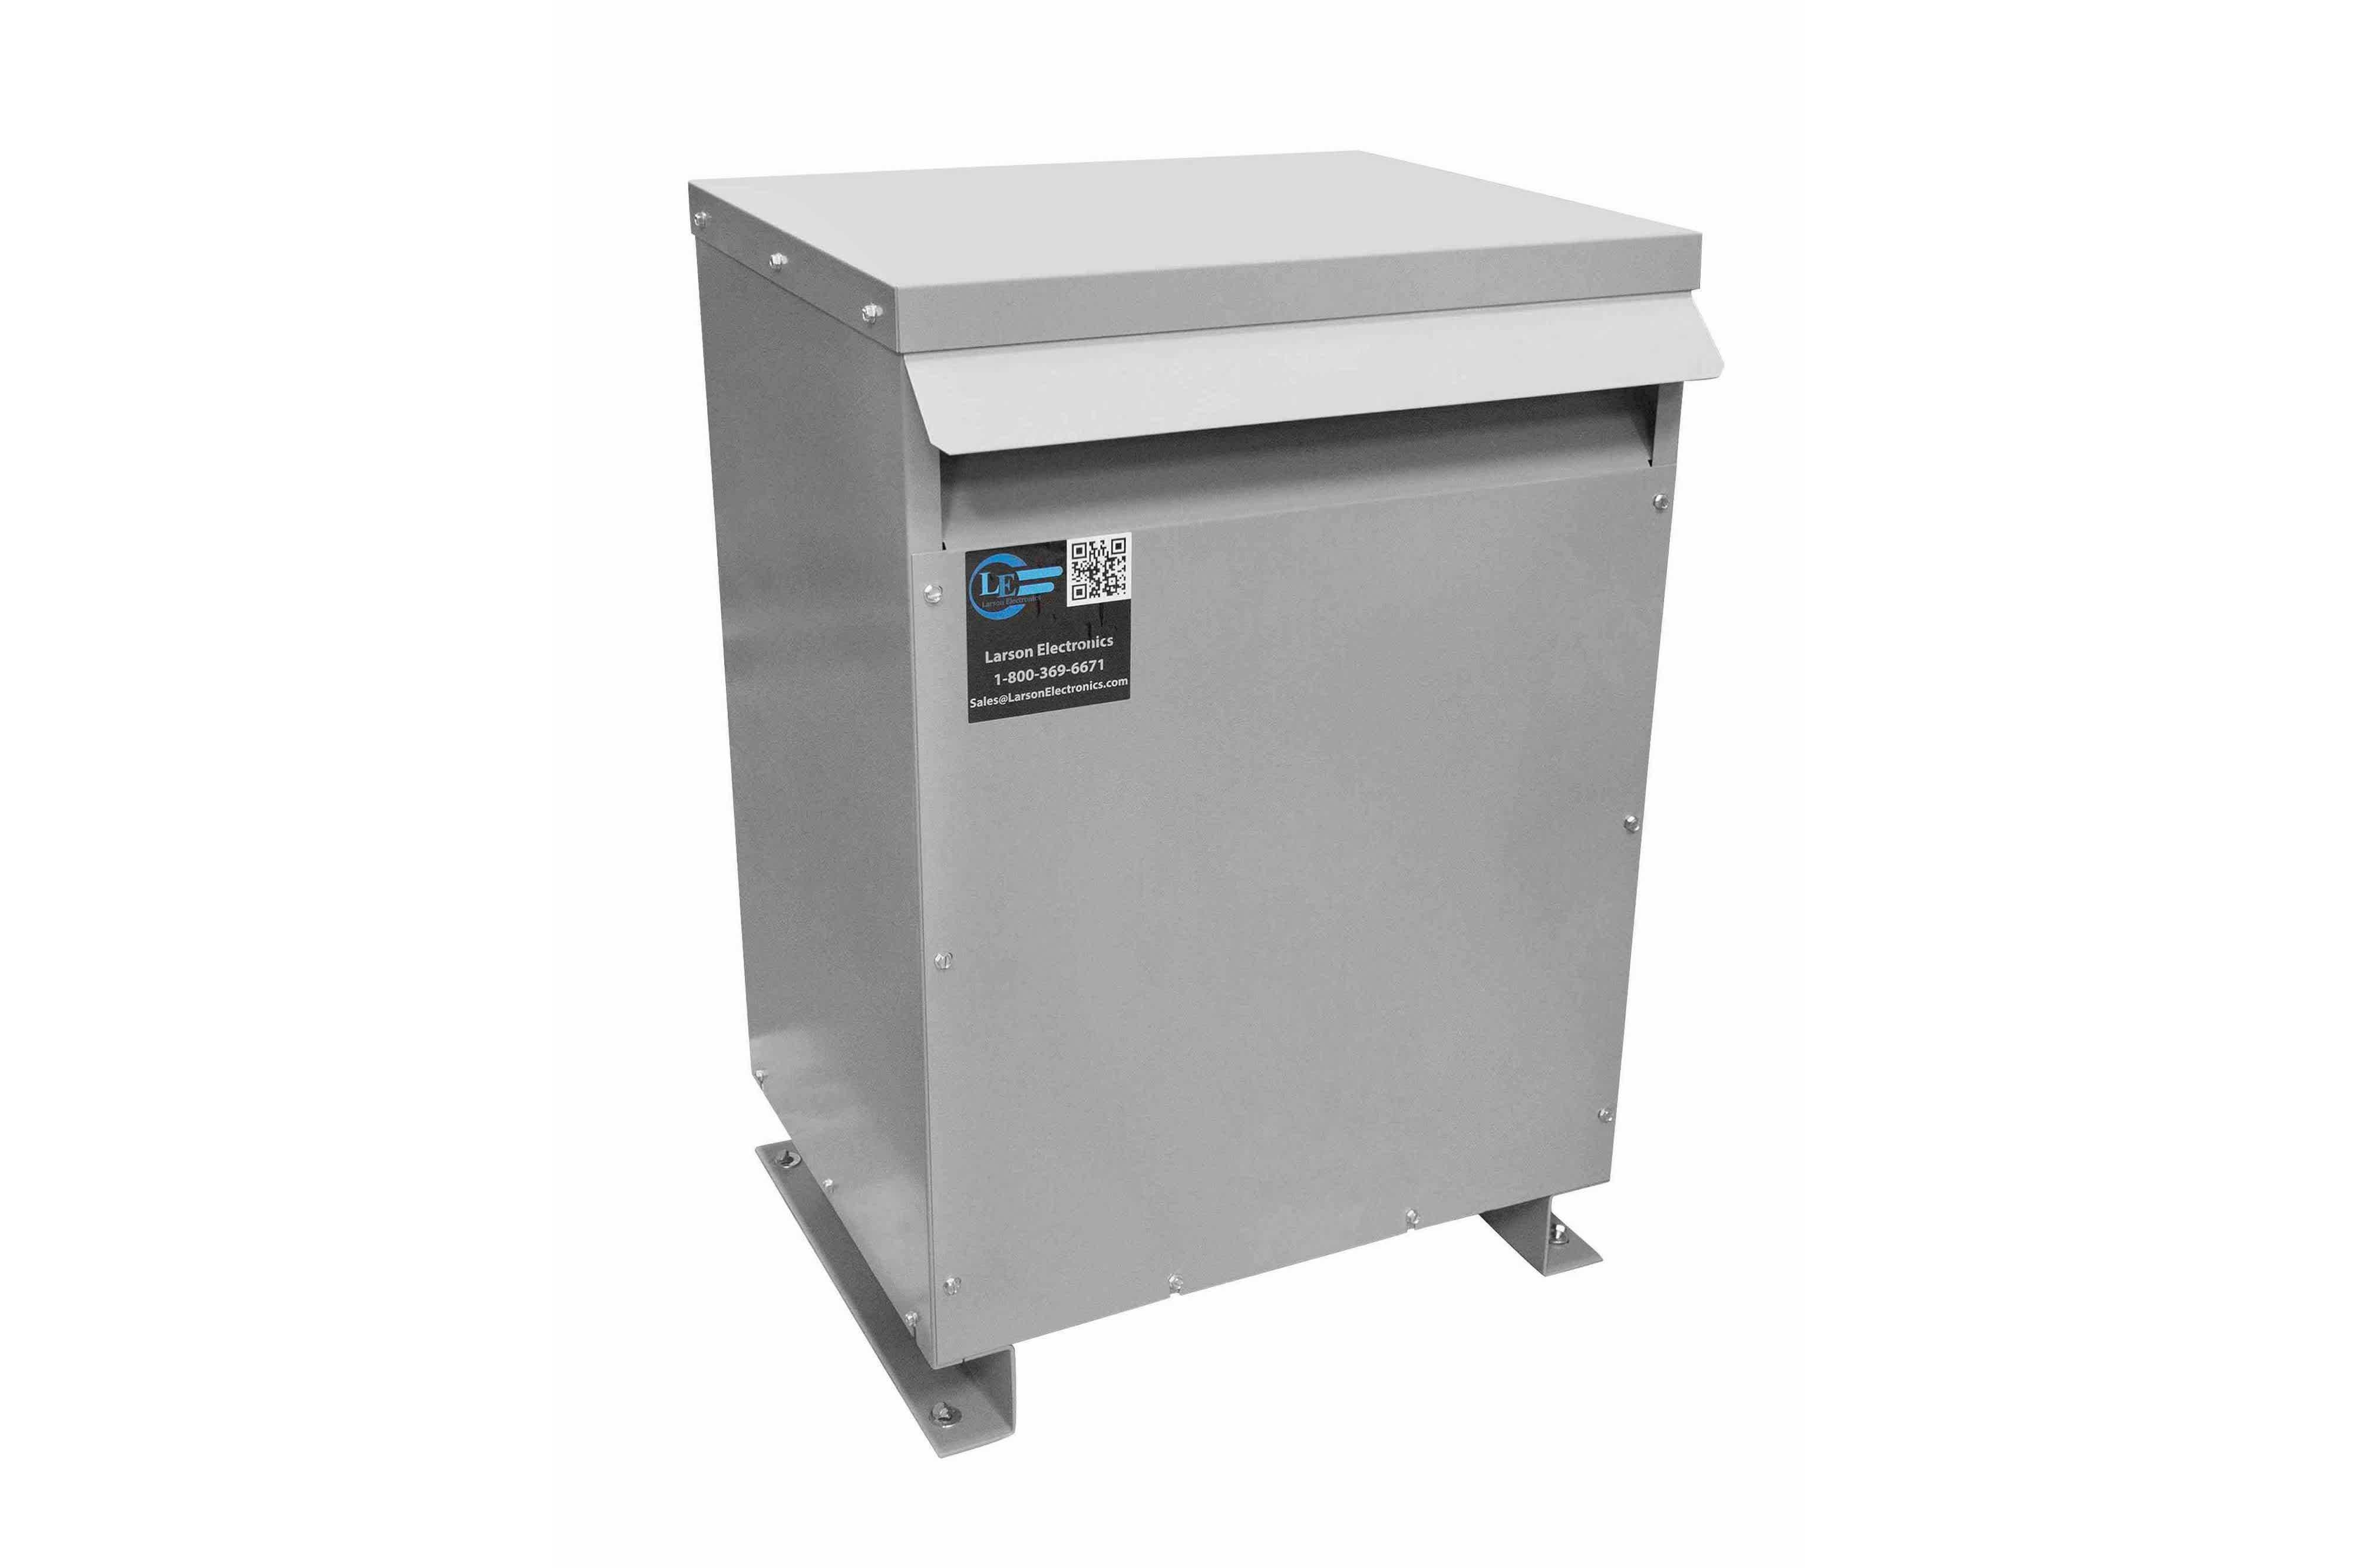 1000 kVA 3PH Isolation Transformer, 440V Wye Primary, 240V Delta Secondary, N3R, Ventilated, 60 Hz